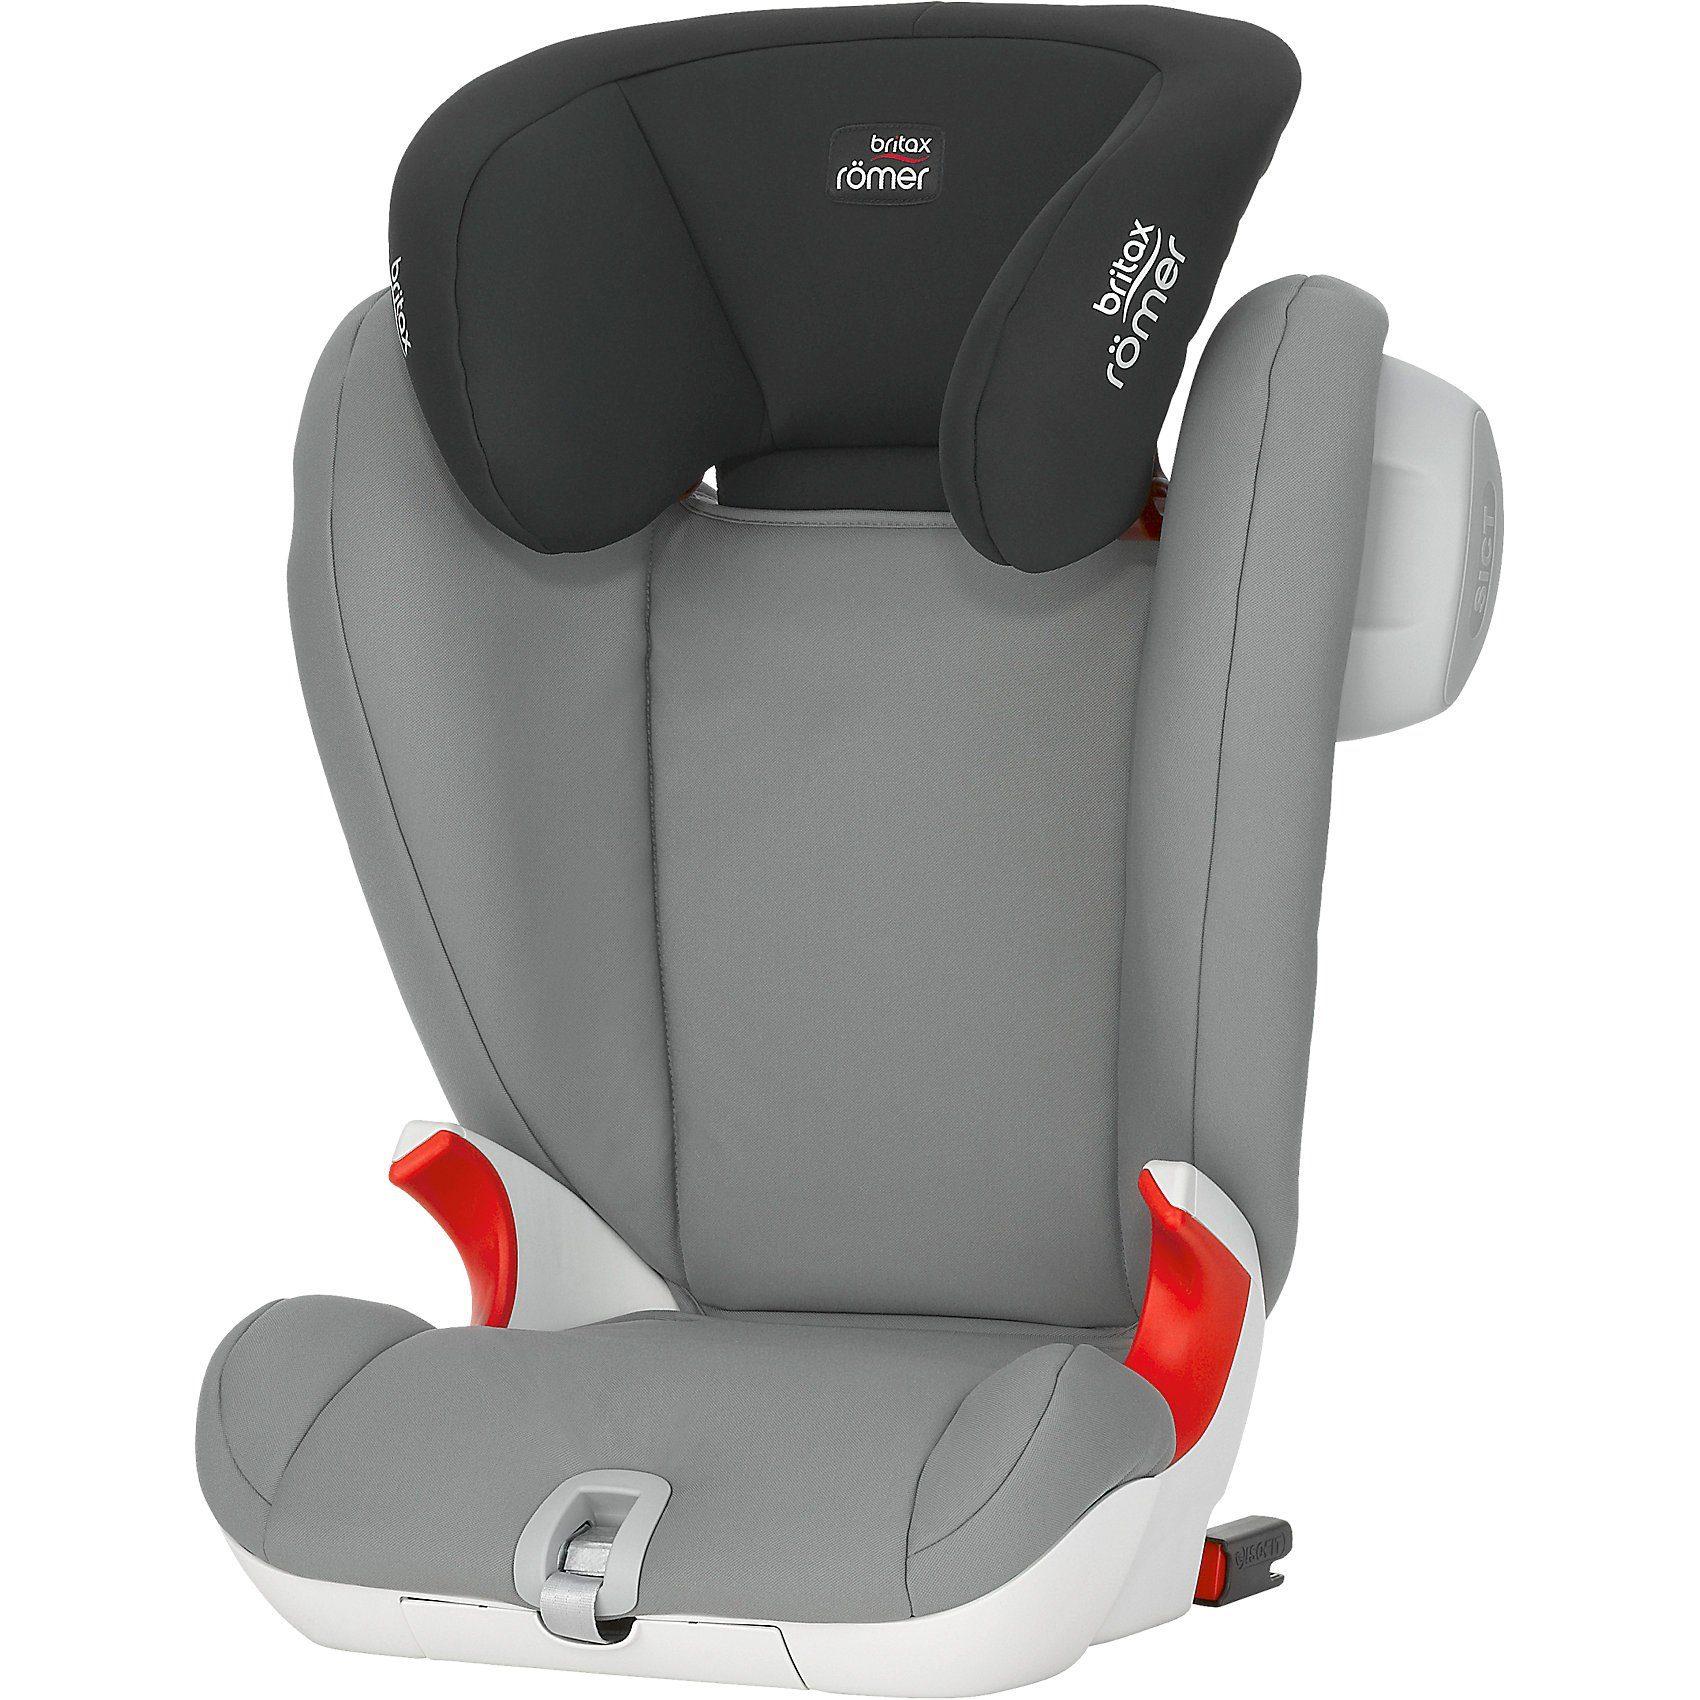 Britax Römer Auto-Kindersitz Kidfix SL Sict, Steel Grey, 2016